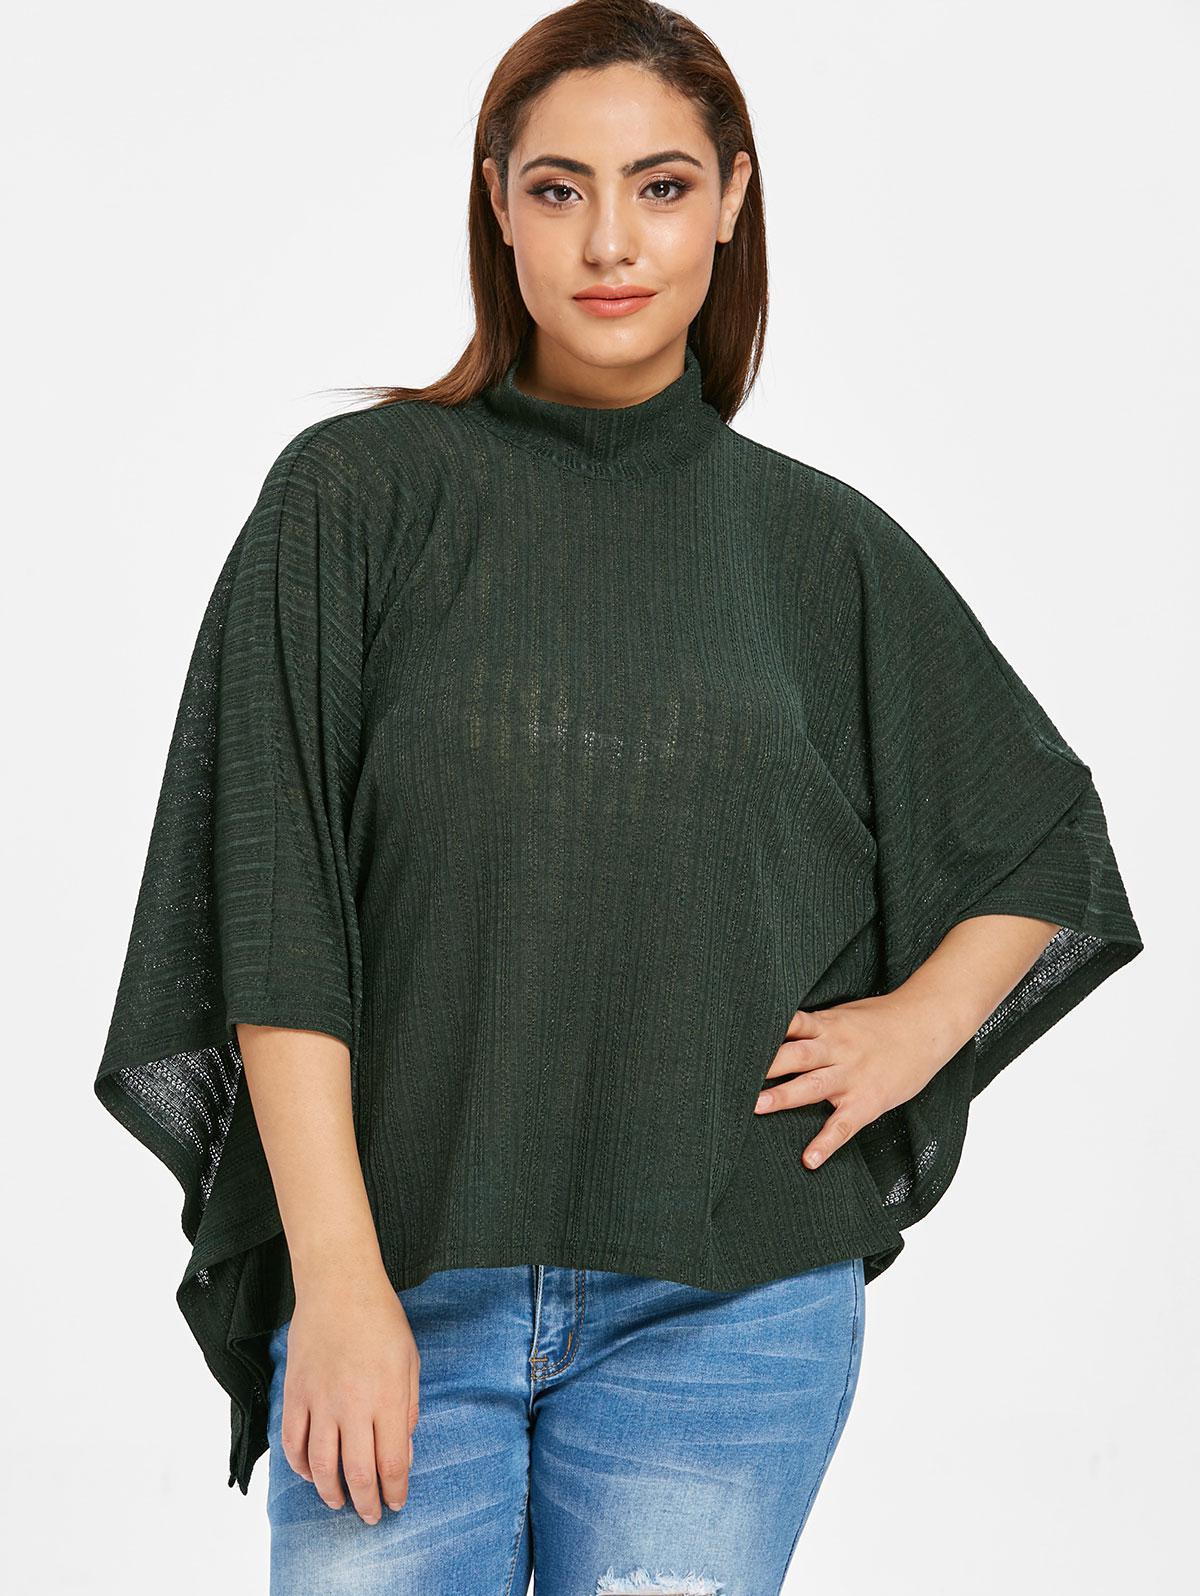 ZAFUL Plus Size Batwing Knitwear Top thumbnail